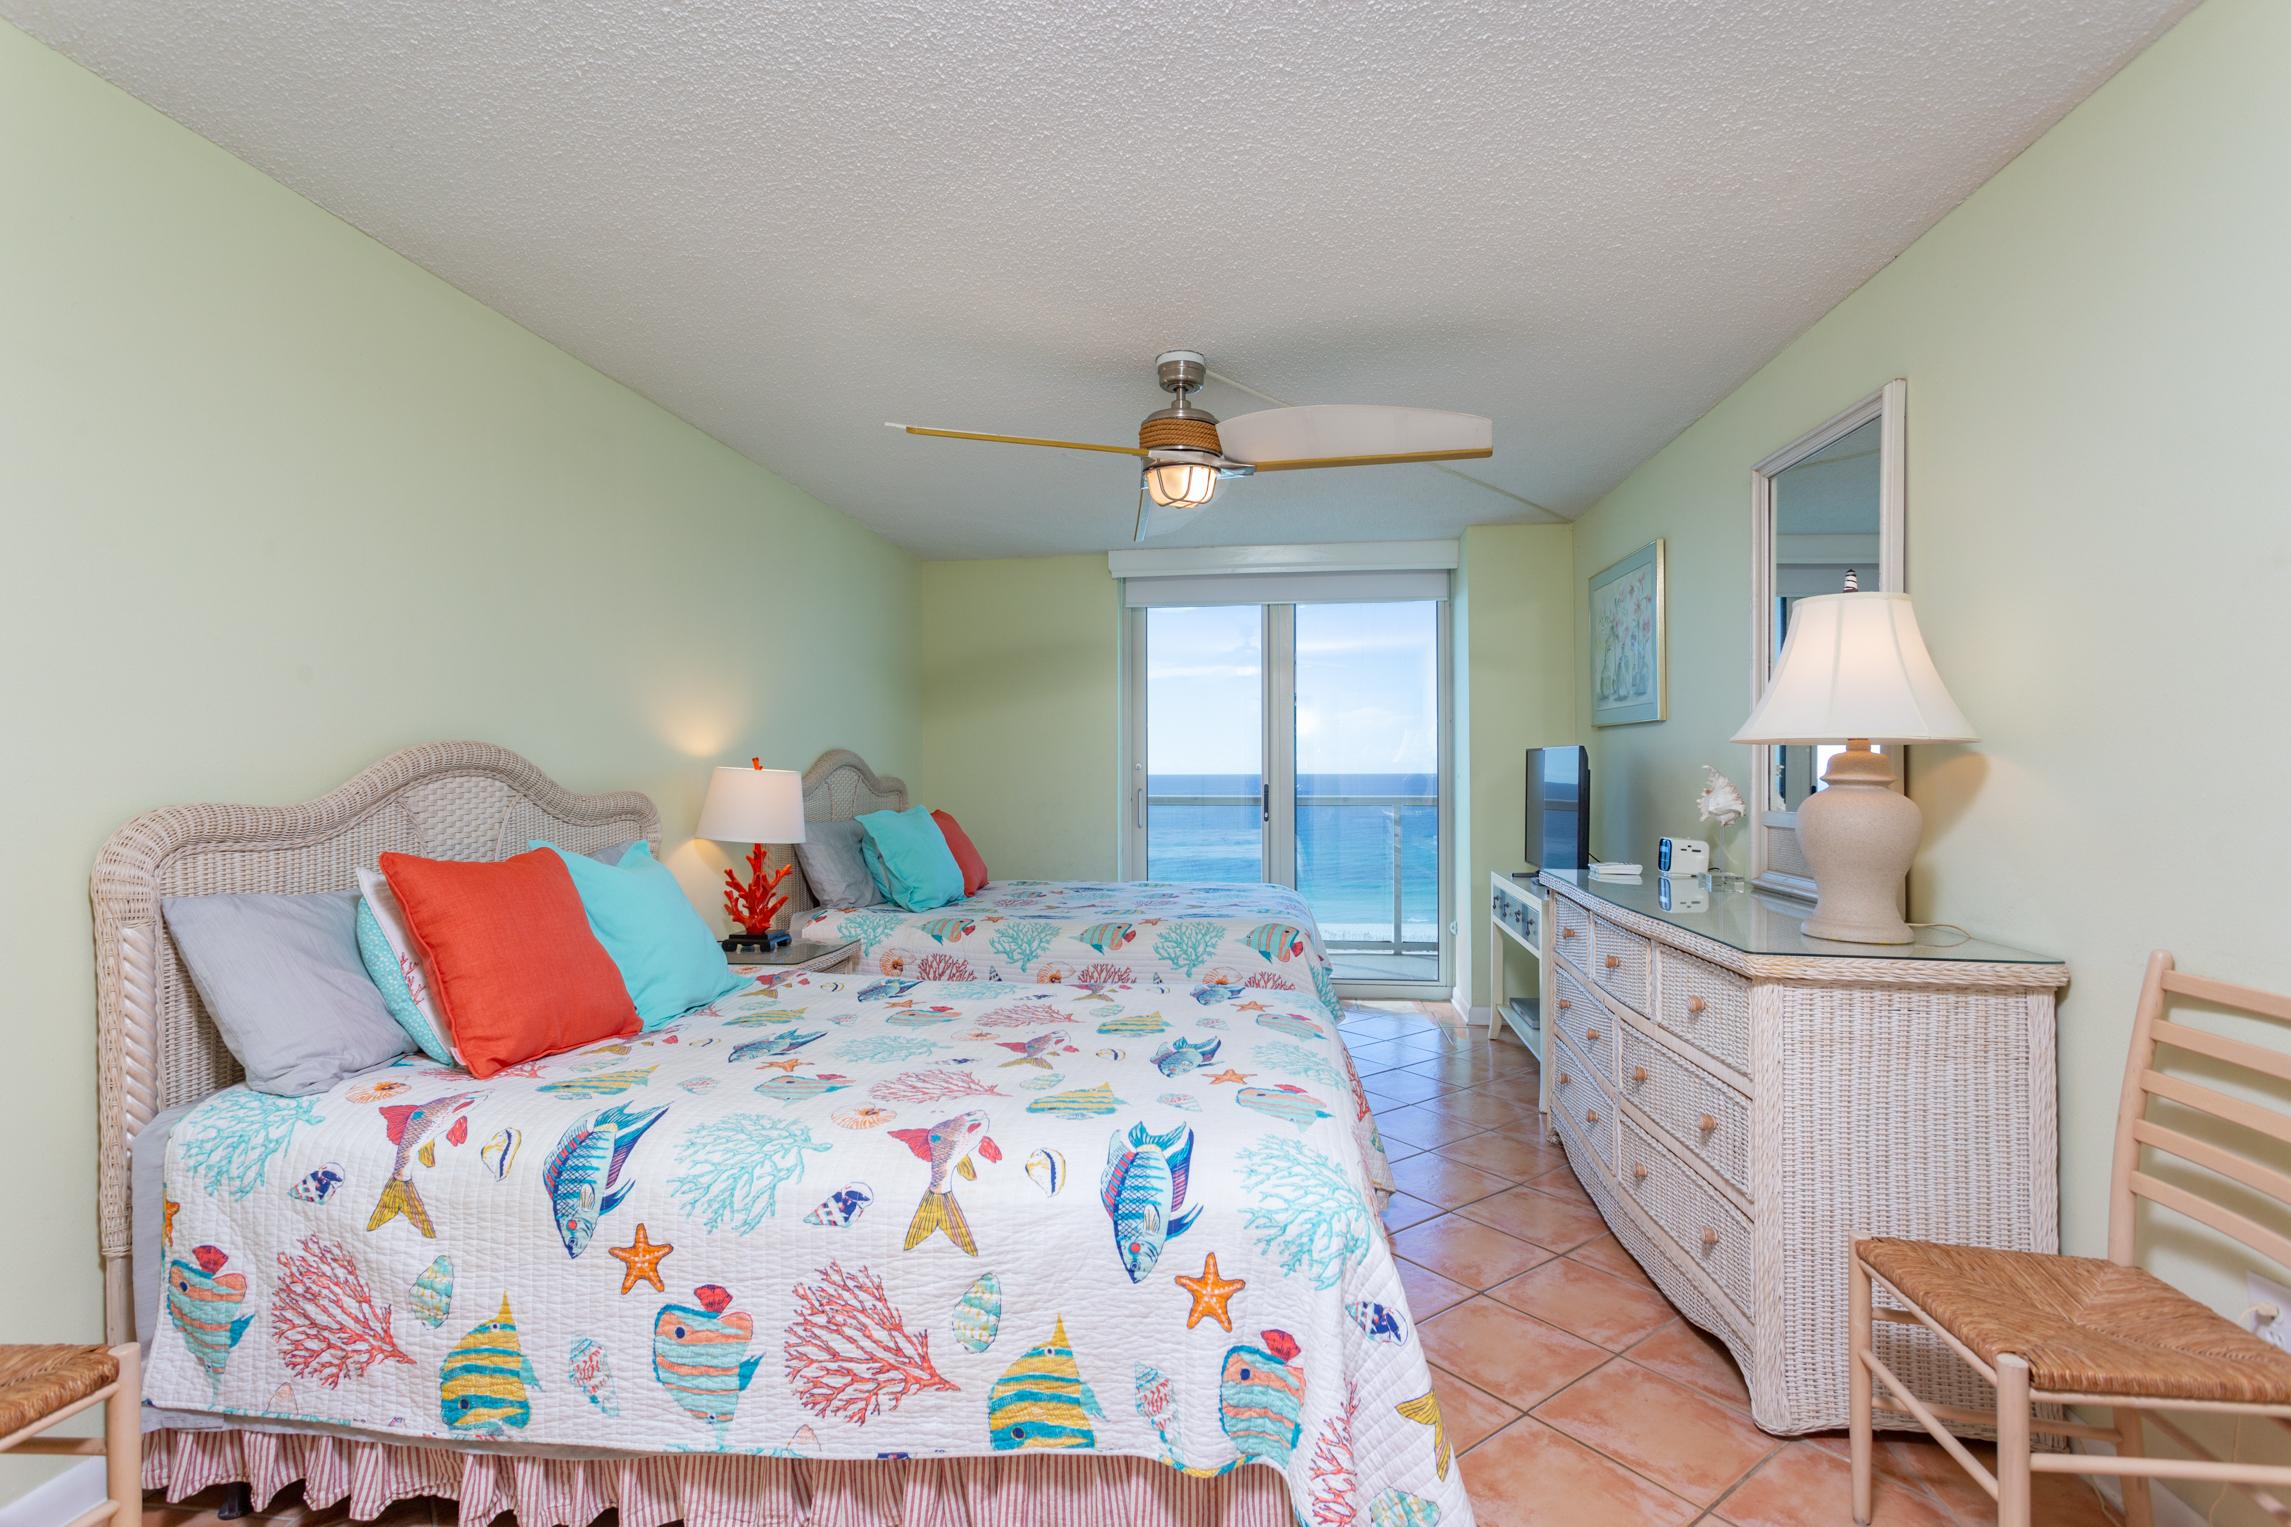 Sabine Yacht & Racquet Club #9D Condo rental in Sabine Yacht & Racquet Club ~ Pensacola Beach Condo Rentals by BeachGuide in Pensacola Beach Florida - #10